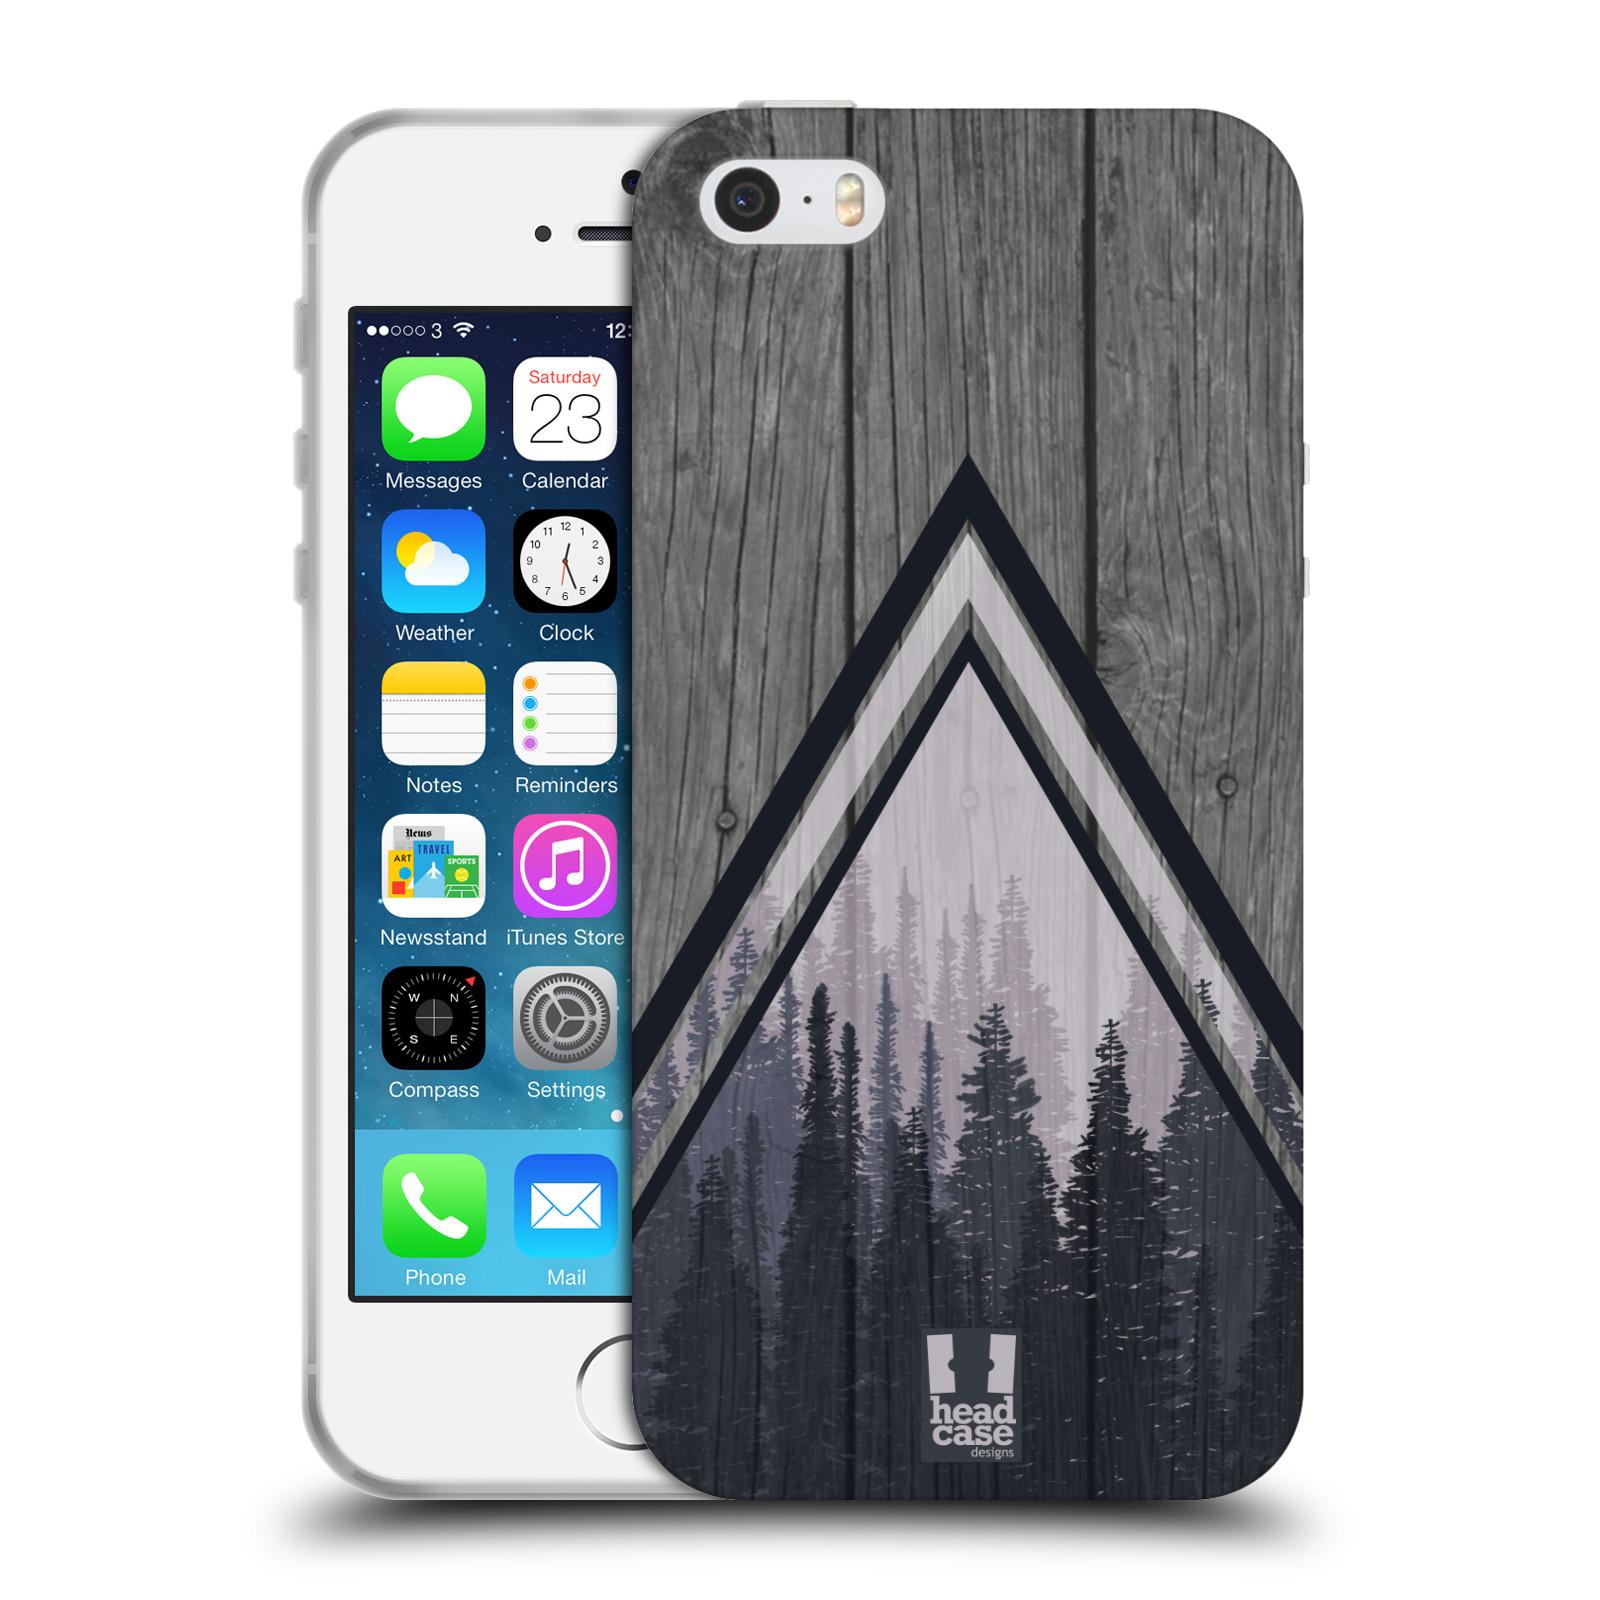 Silikonové pouzdro na mobil Apple iPhone 5, 5S, SE - Head Case - Dřevo a temný les